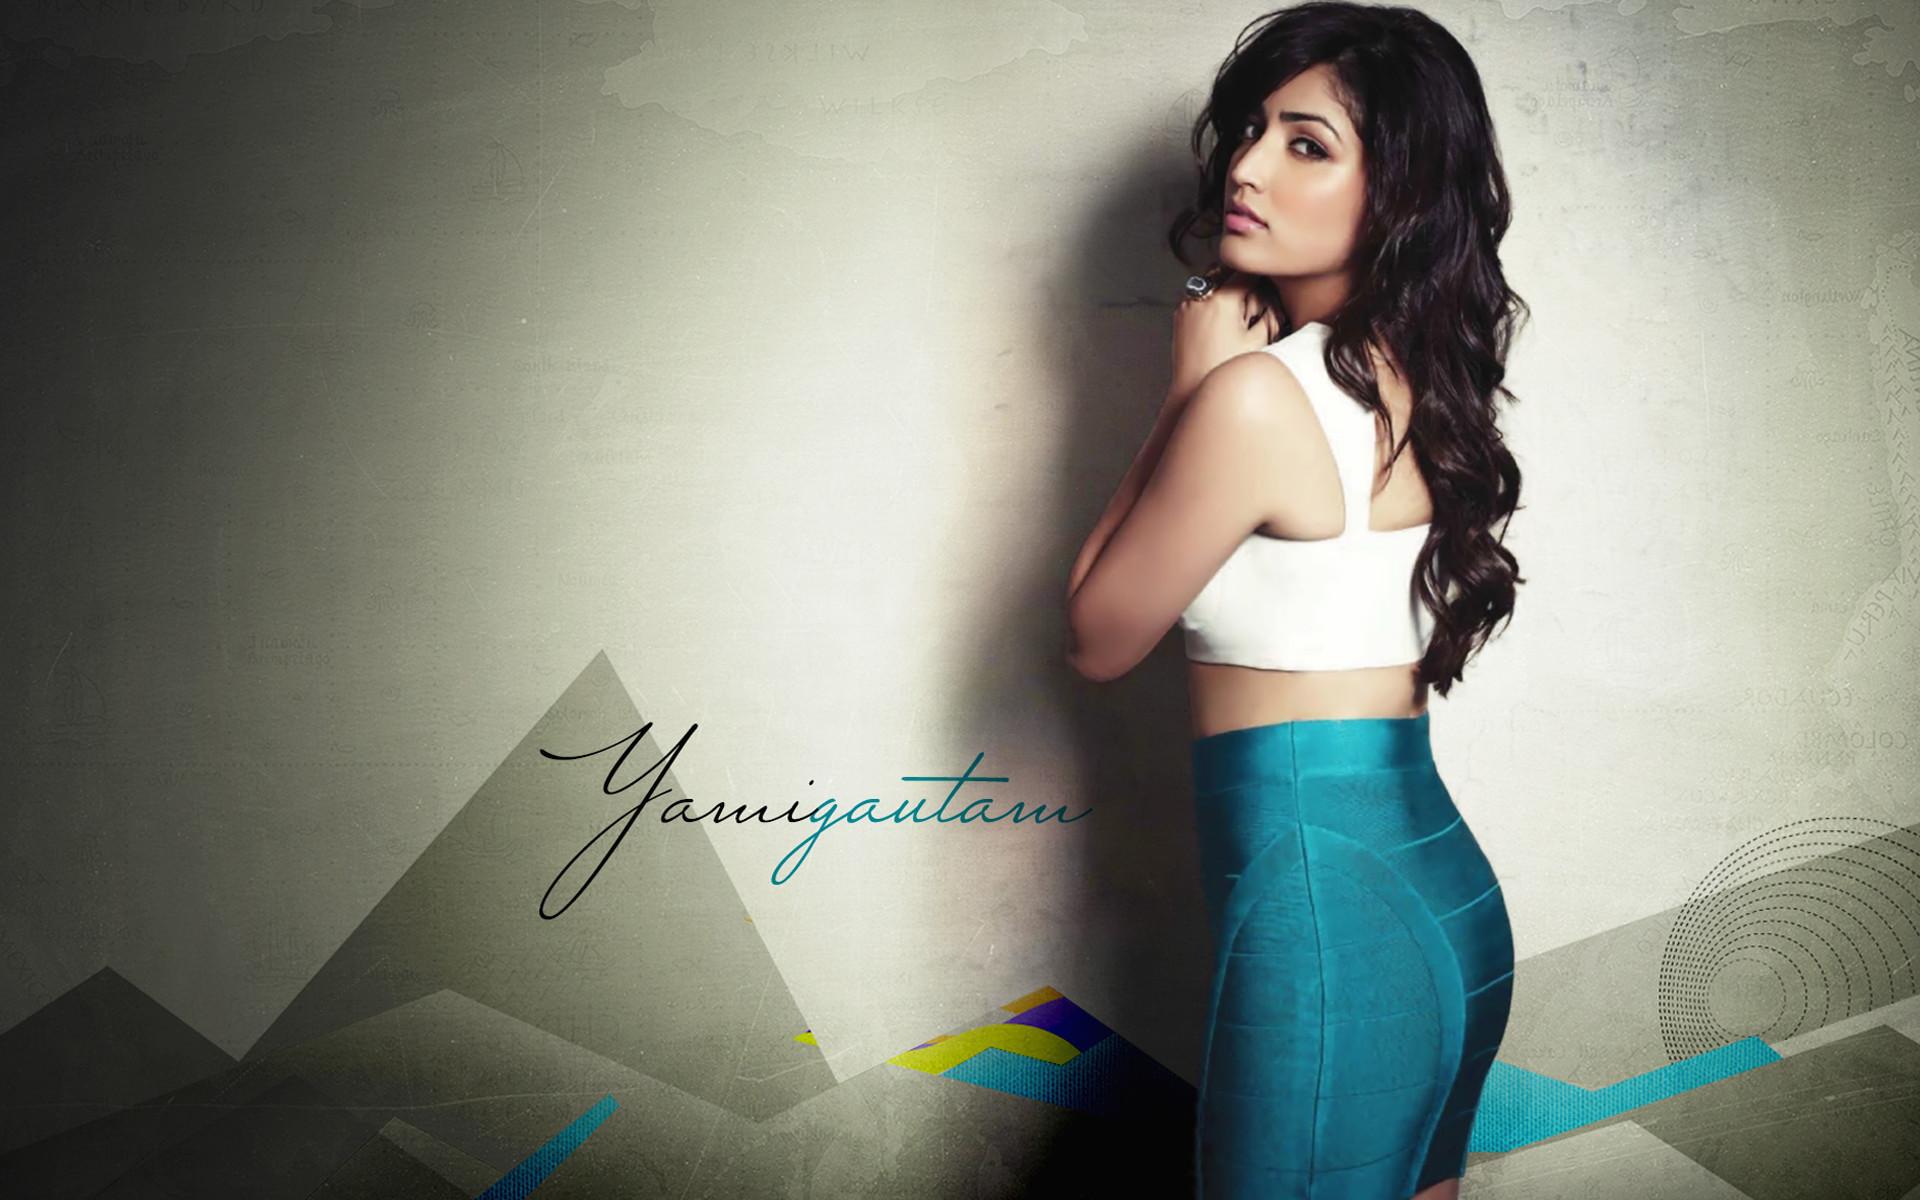 Yami Gautam New sexy HD Wallpaper Yami Gautam, Bollywood, Actress , Hot,  Sexy